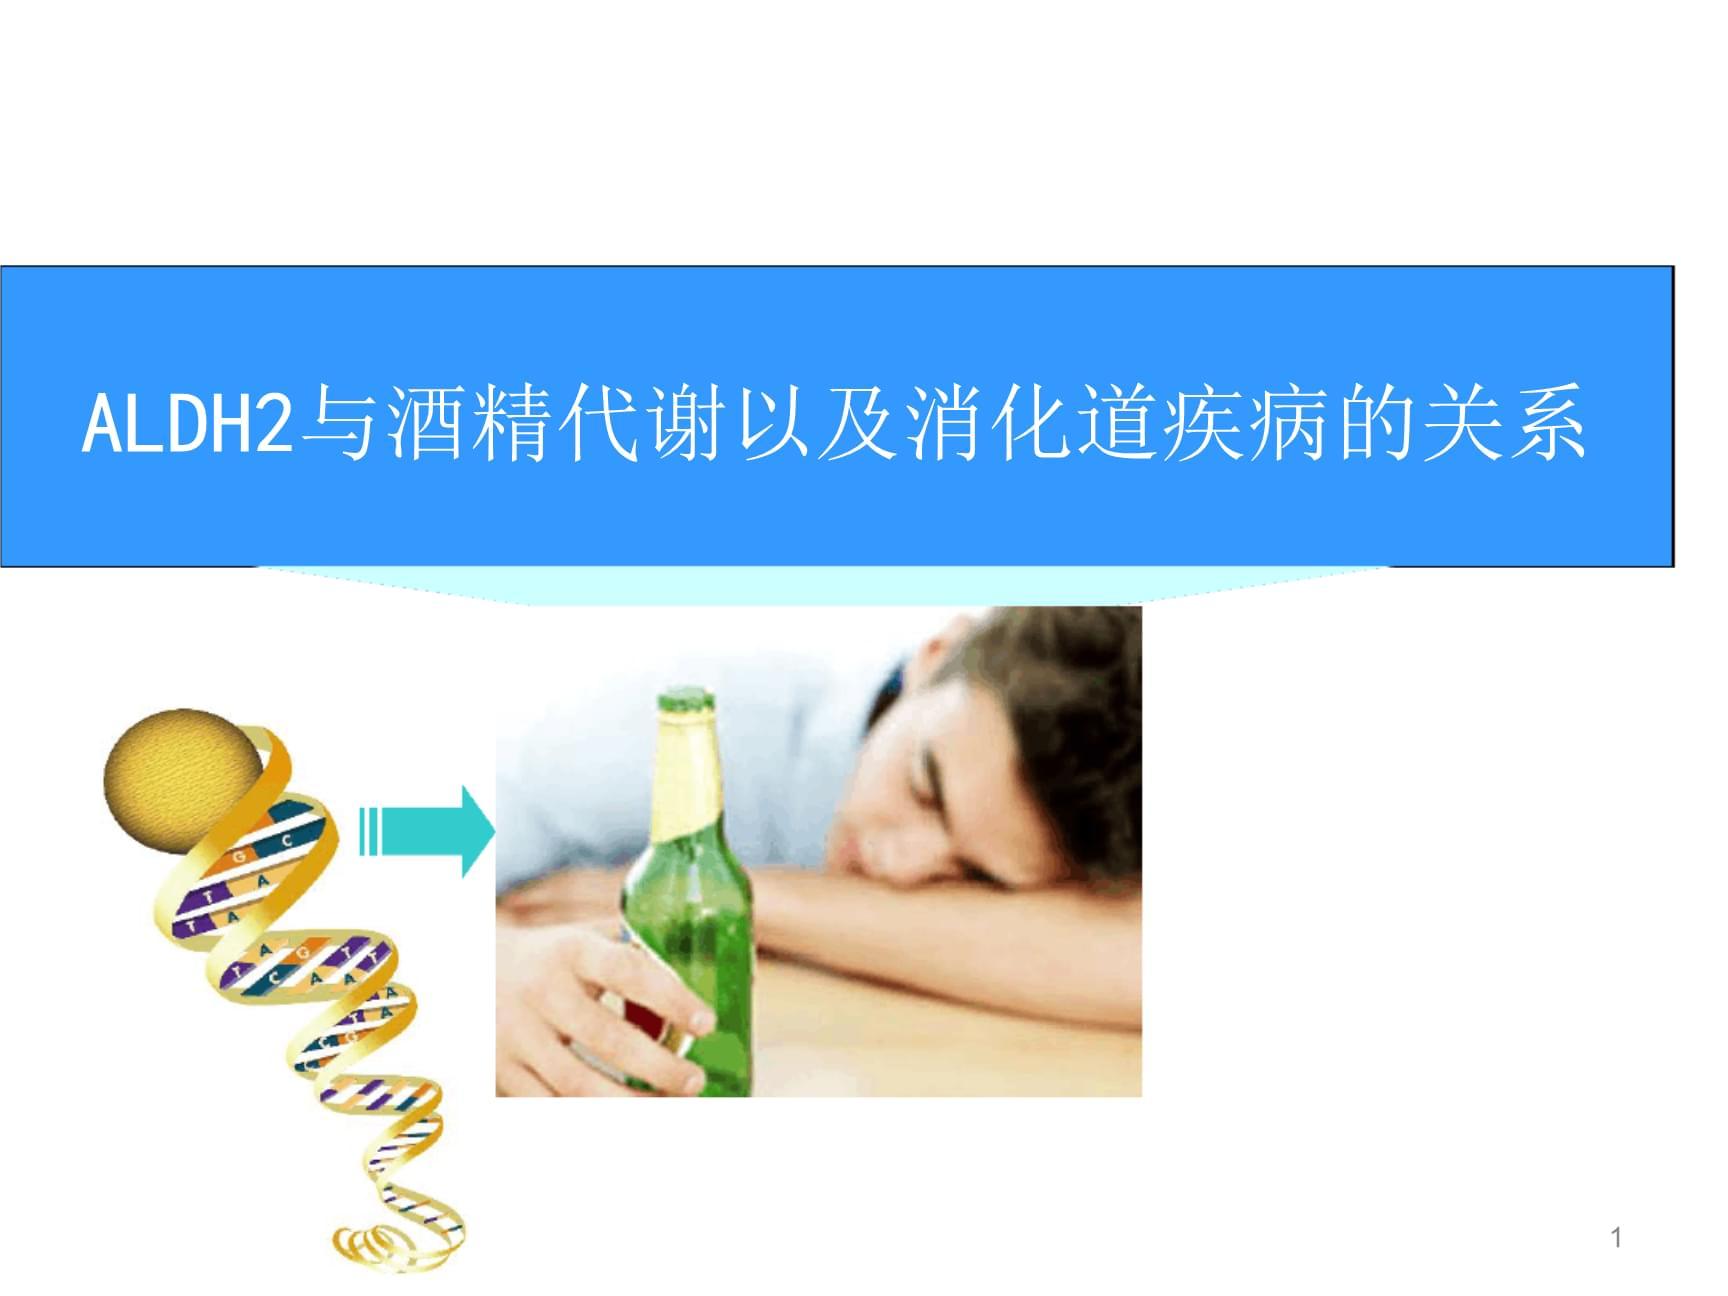 ALDH2基因检测演示幻灯片.ppt